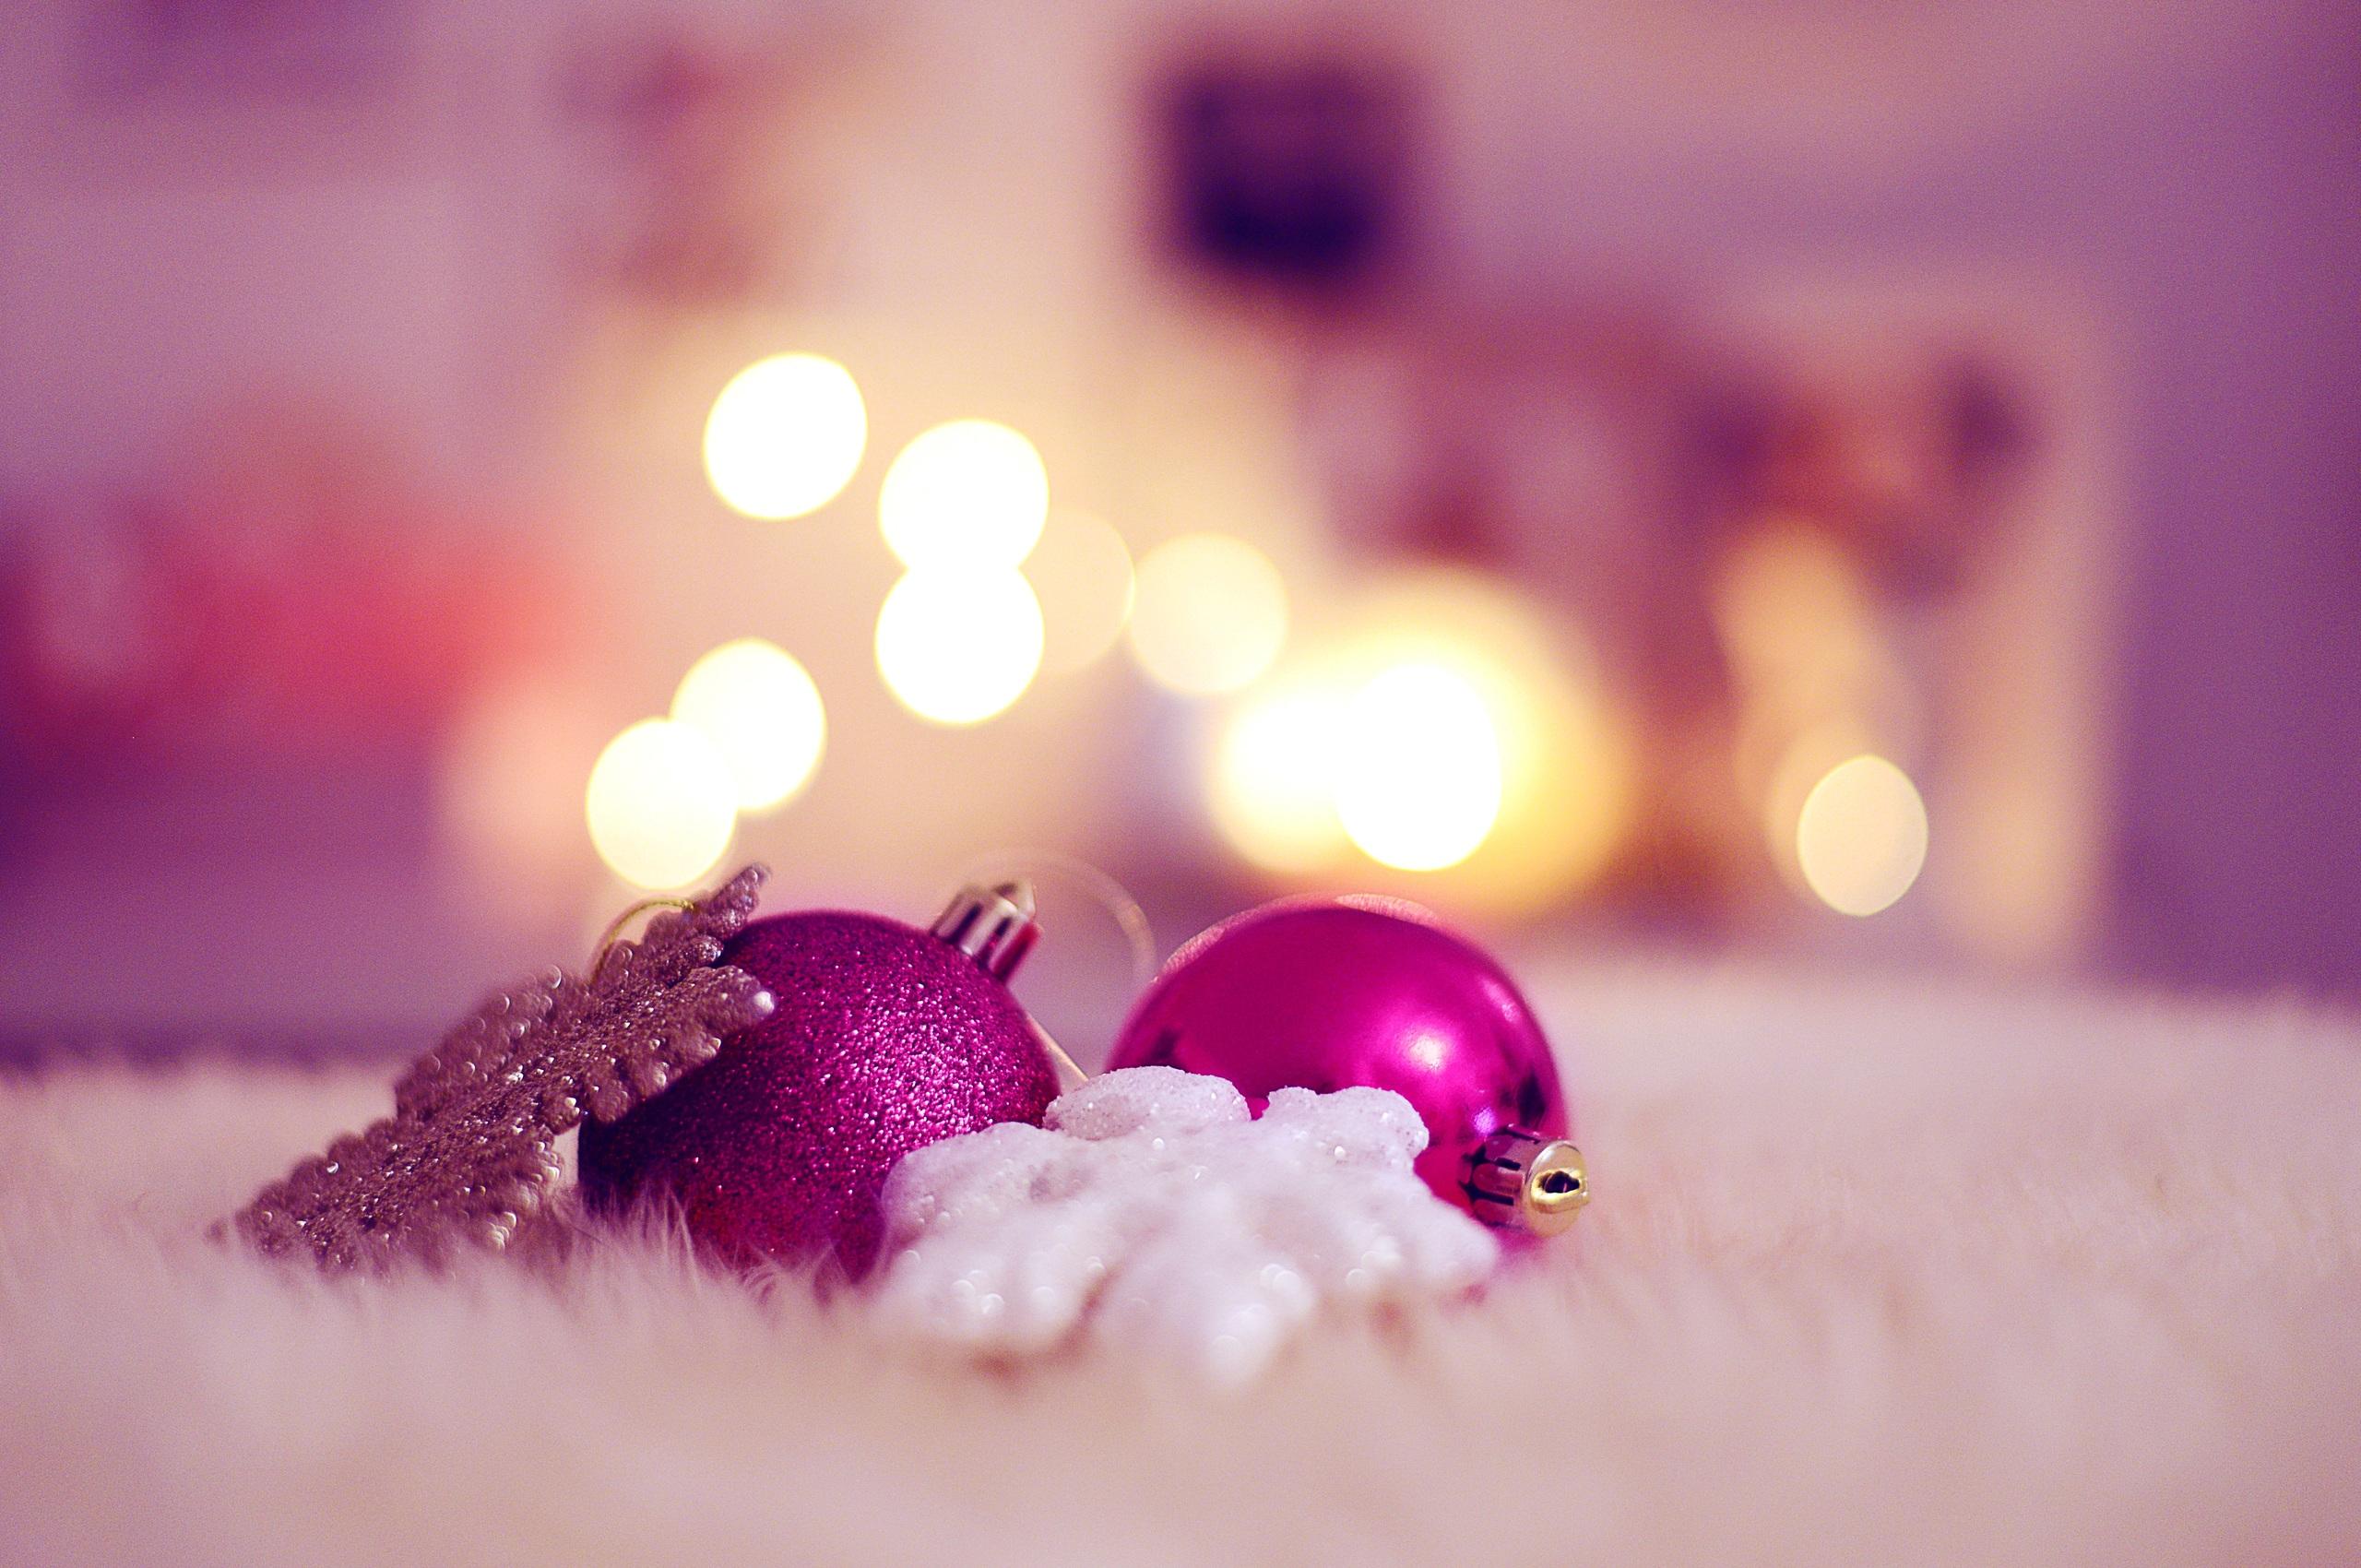 Simple Wallpaper Christmas Chromebook - christmas-bells-ultra-hd-5k-os-2560x1700  Best Photo Reference_249369 .jpg